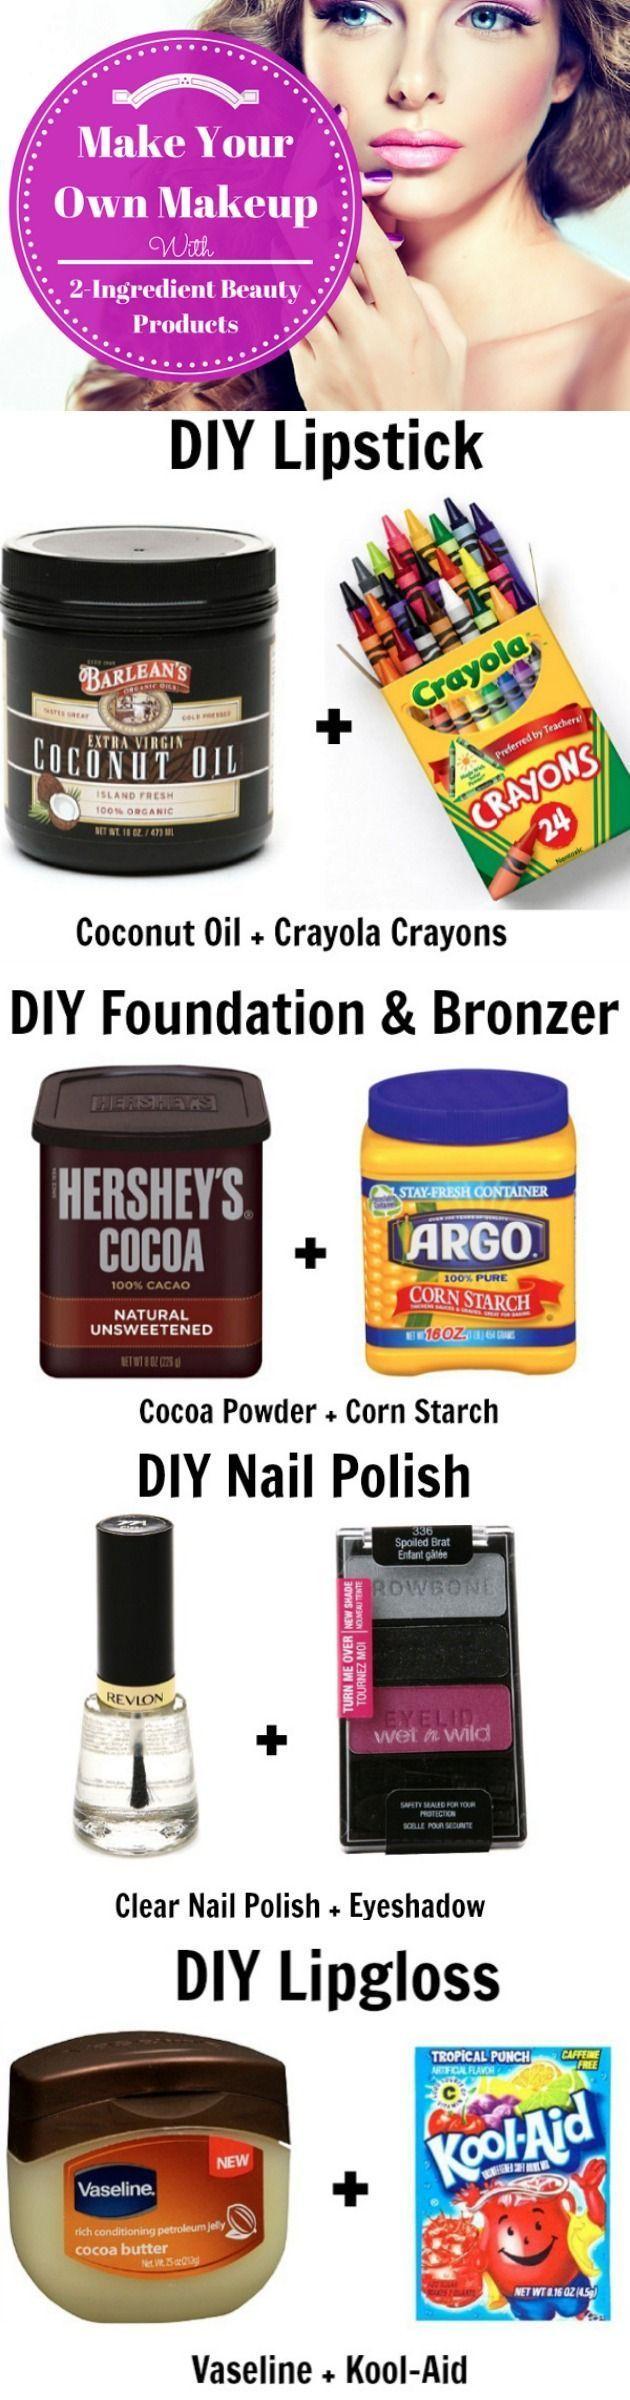 DIY Makeup fashion beauty diy crafts diy ideas easy diy diy makeup teen crafts crafts for teens money saving